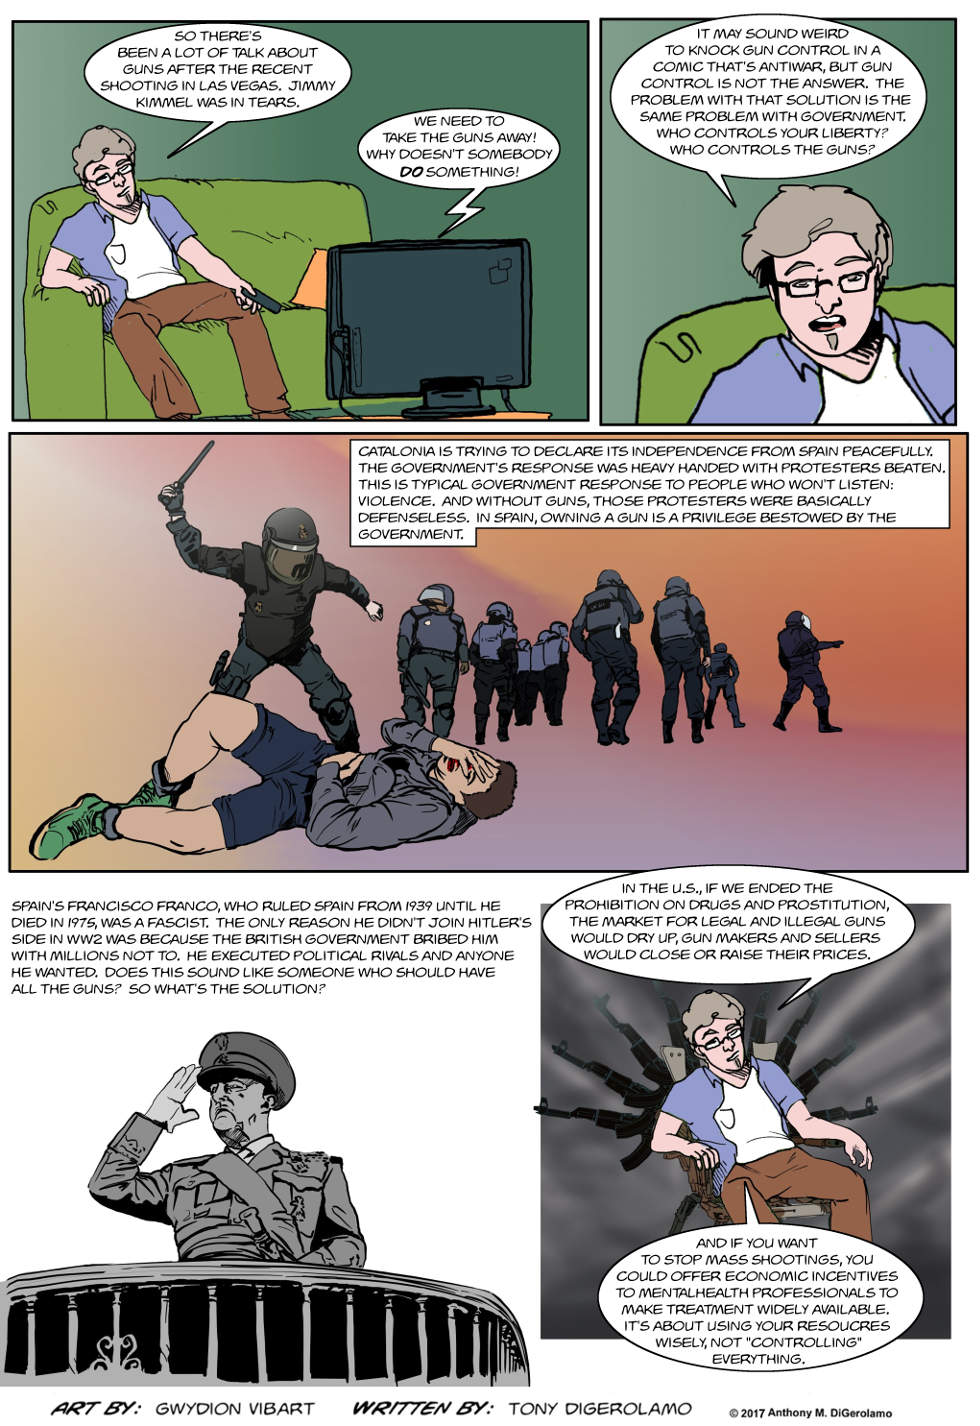 The Antiwar Comic:  Who Controls the Guns?